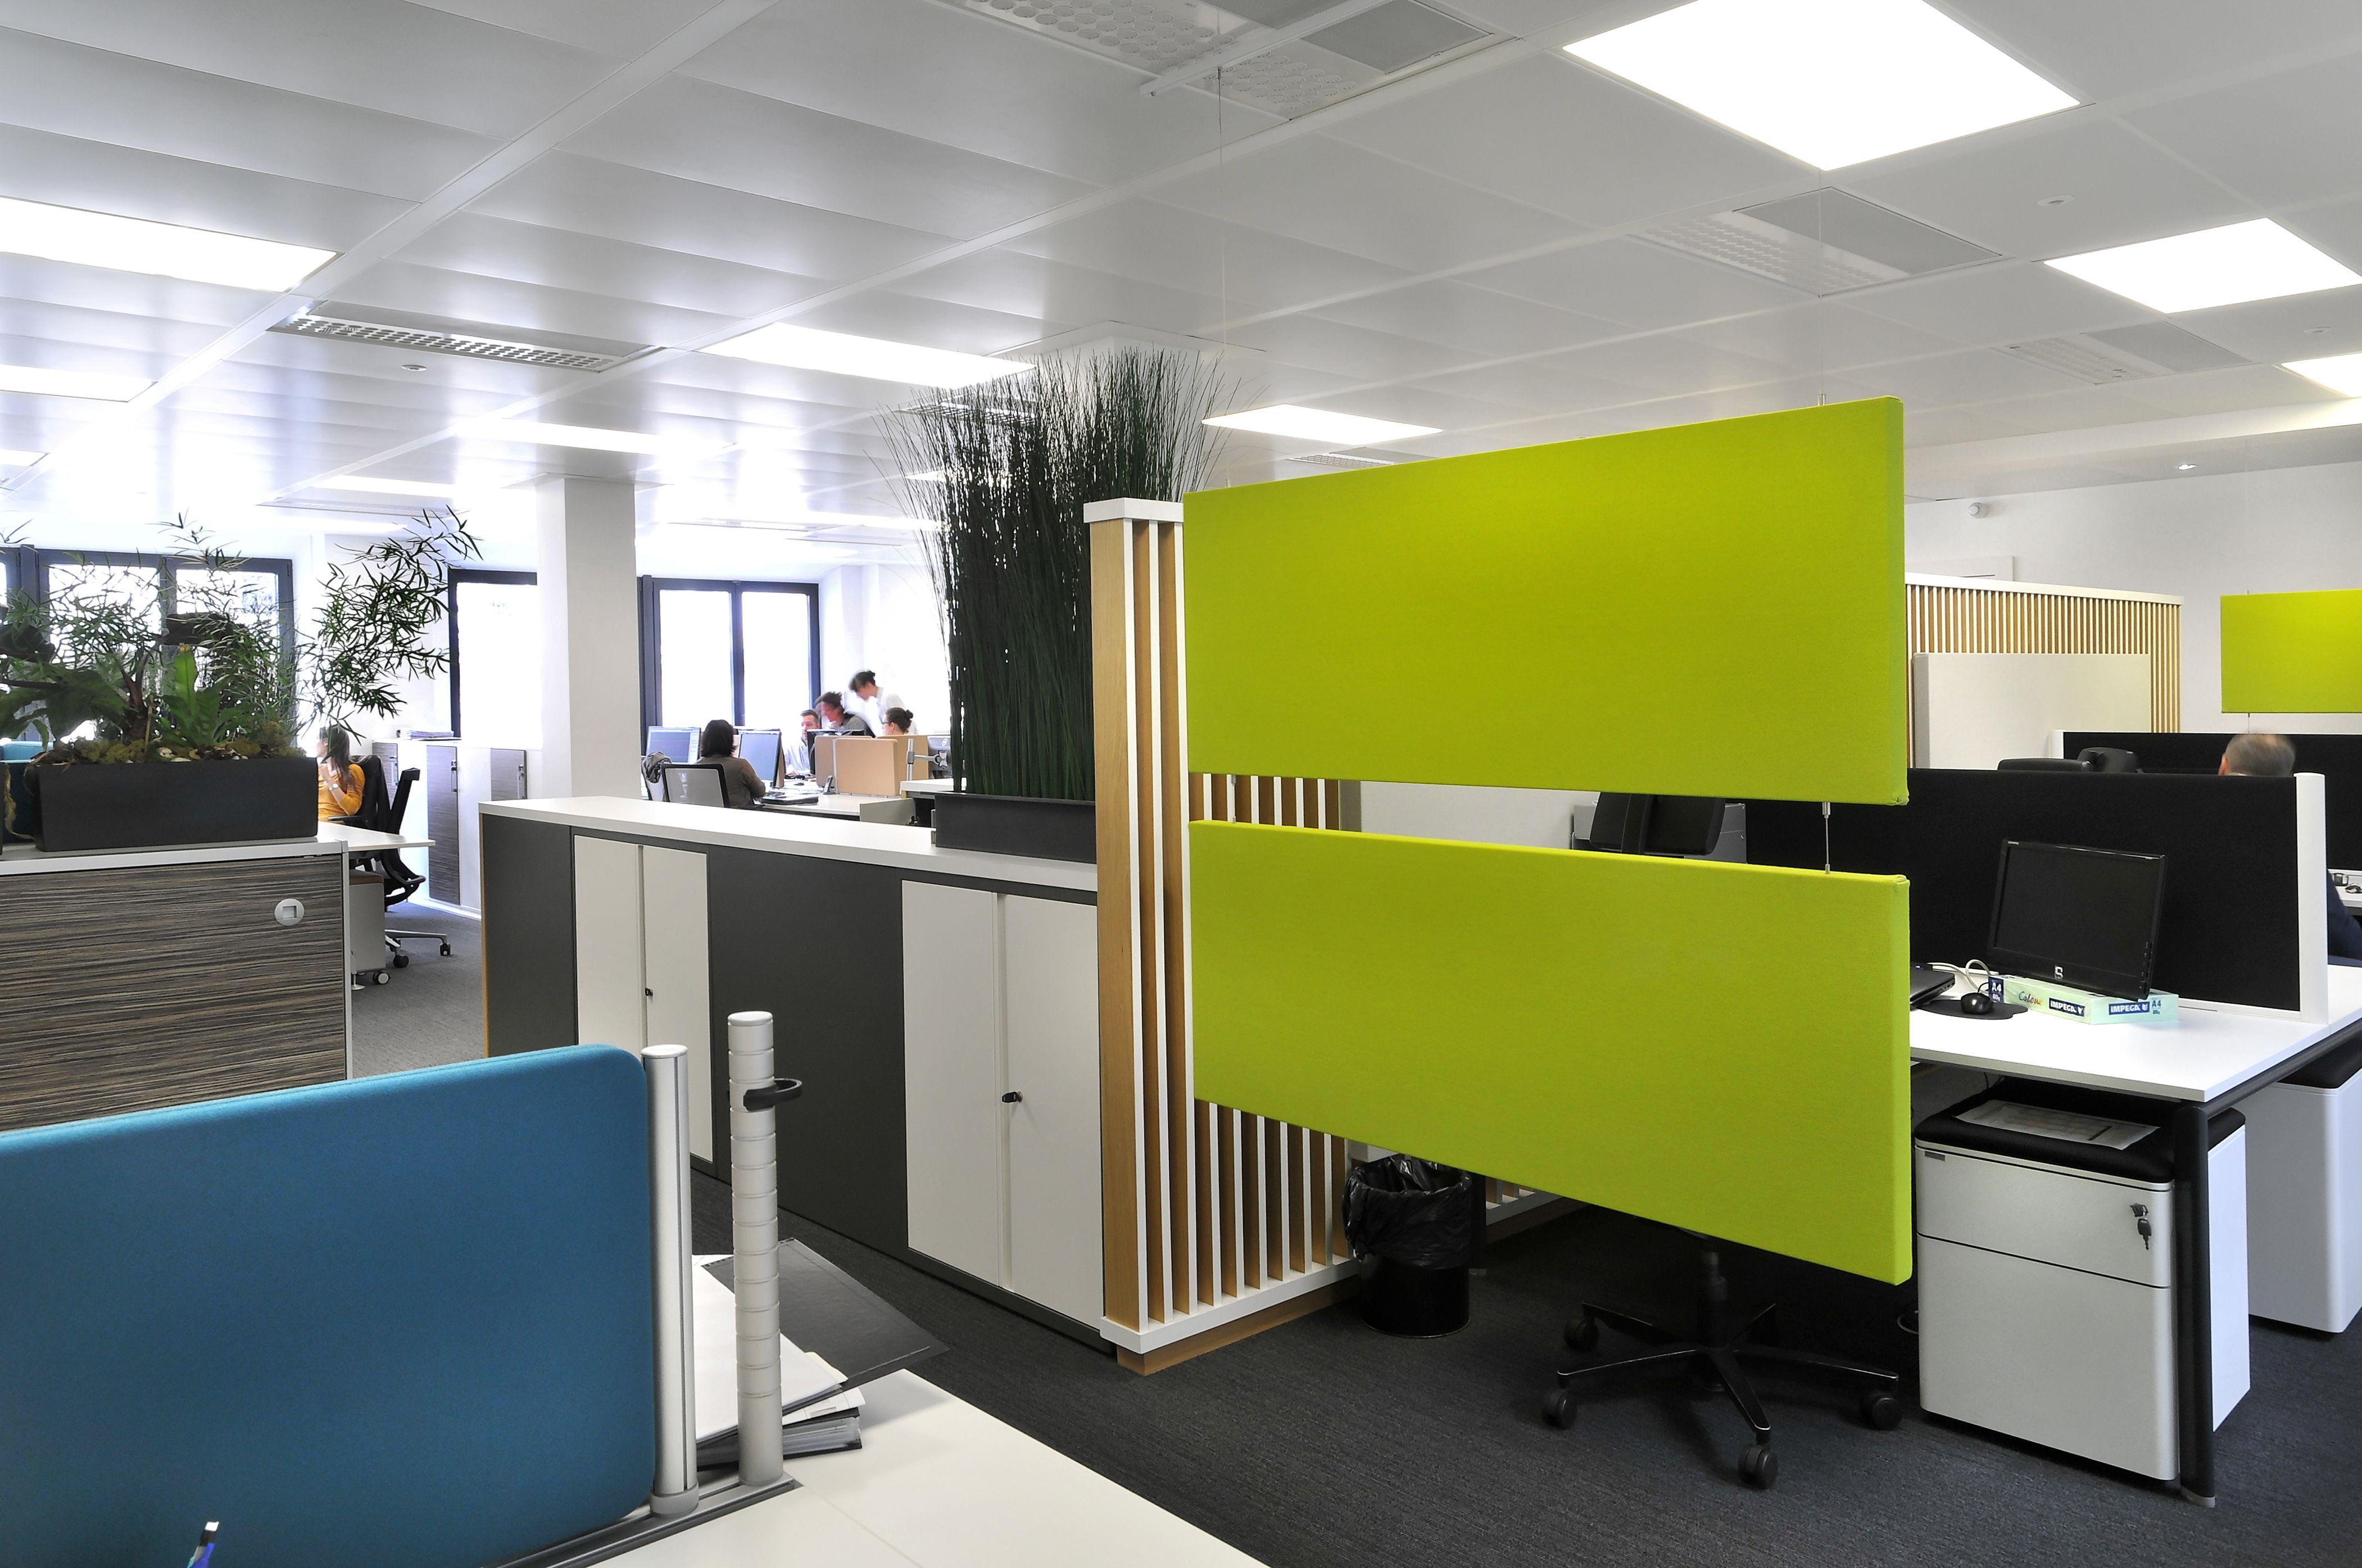 open space agence par cleram style design bureau architecture amenagement workspace coolworking interior deco cleram art office idea